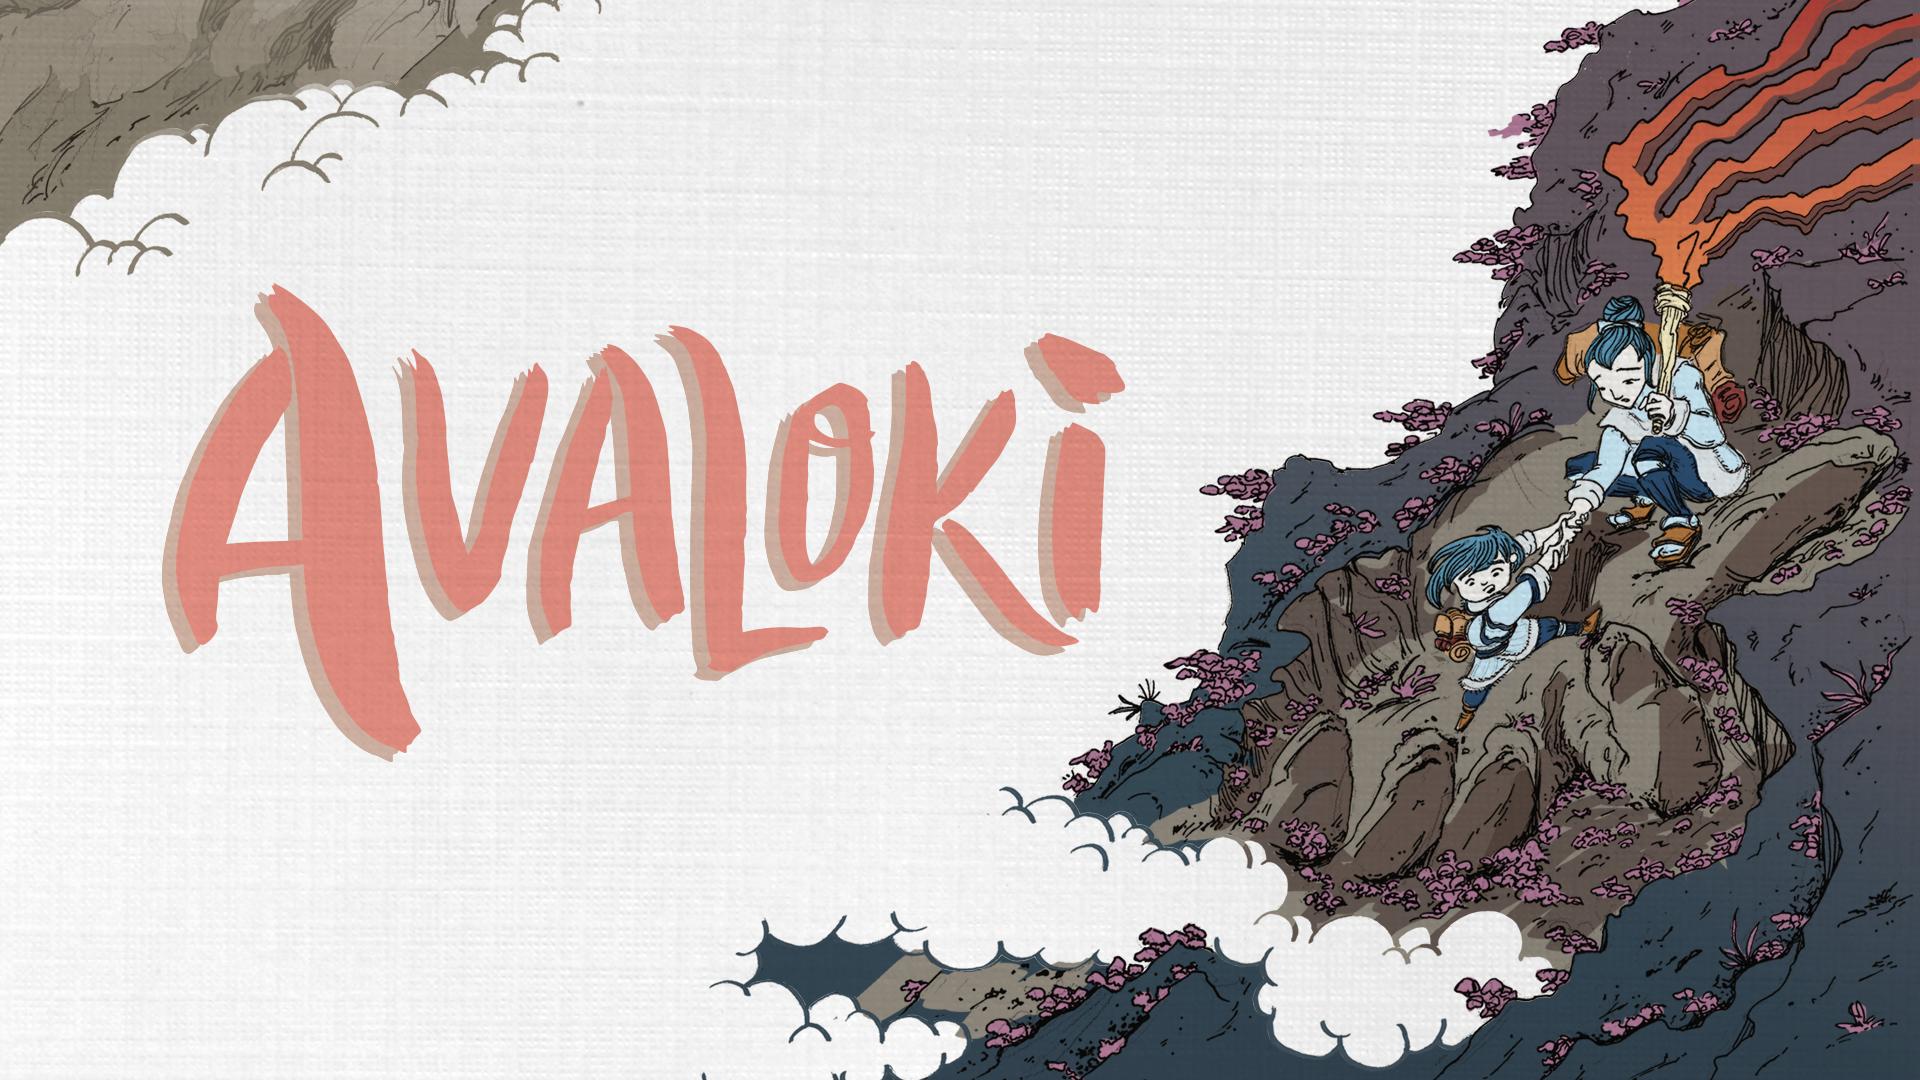 Avaloki - 16x9 landscape.jpg